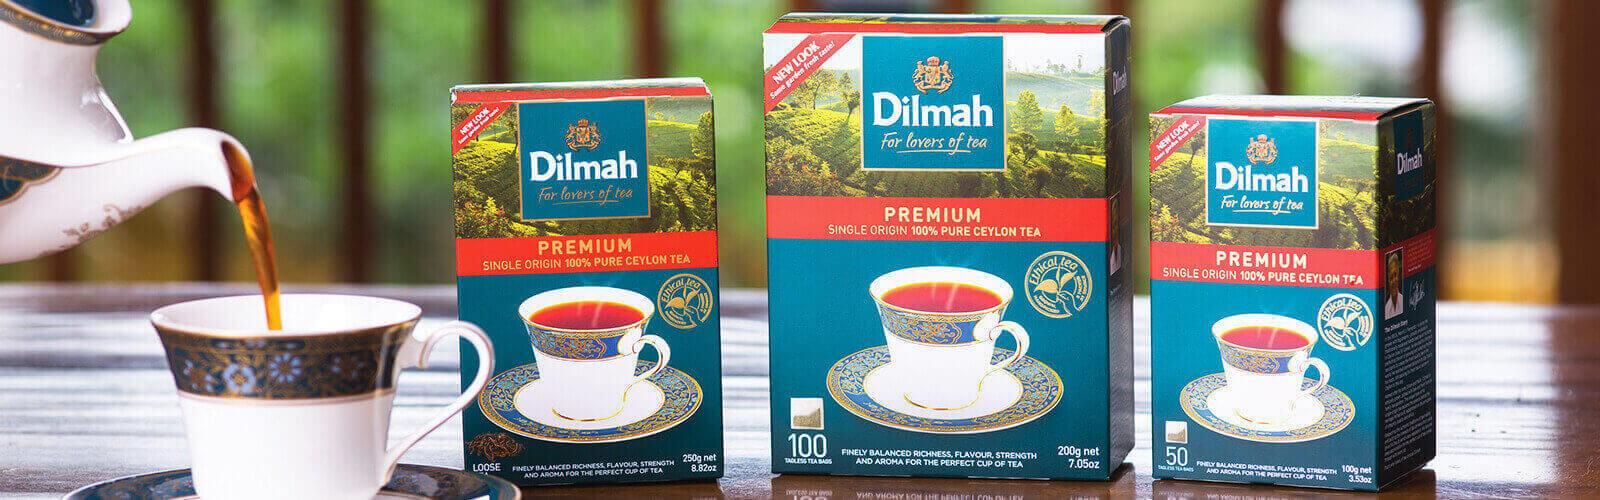 Dilmah Tea Inspired